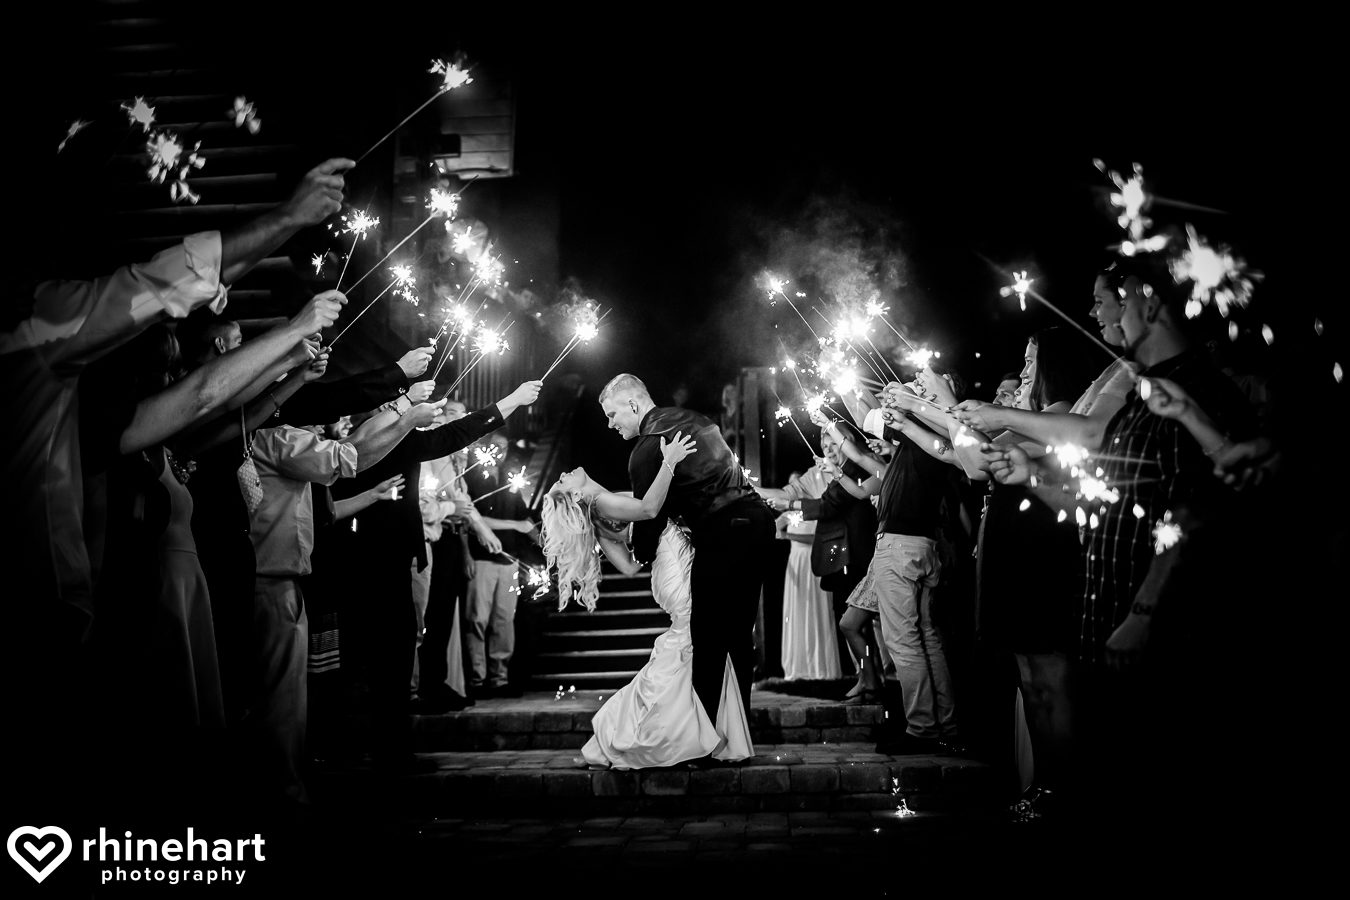 creative-unique-artistic-best-top-colorful-vibrant-emotional-pa-wedding-photographers-19